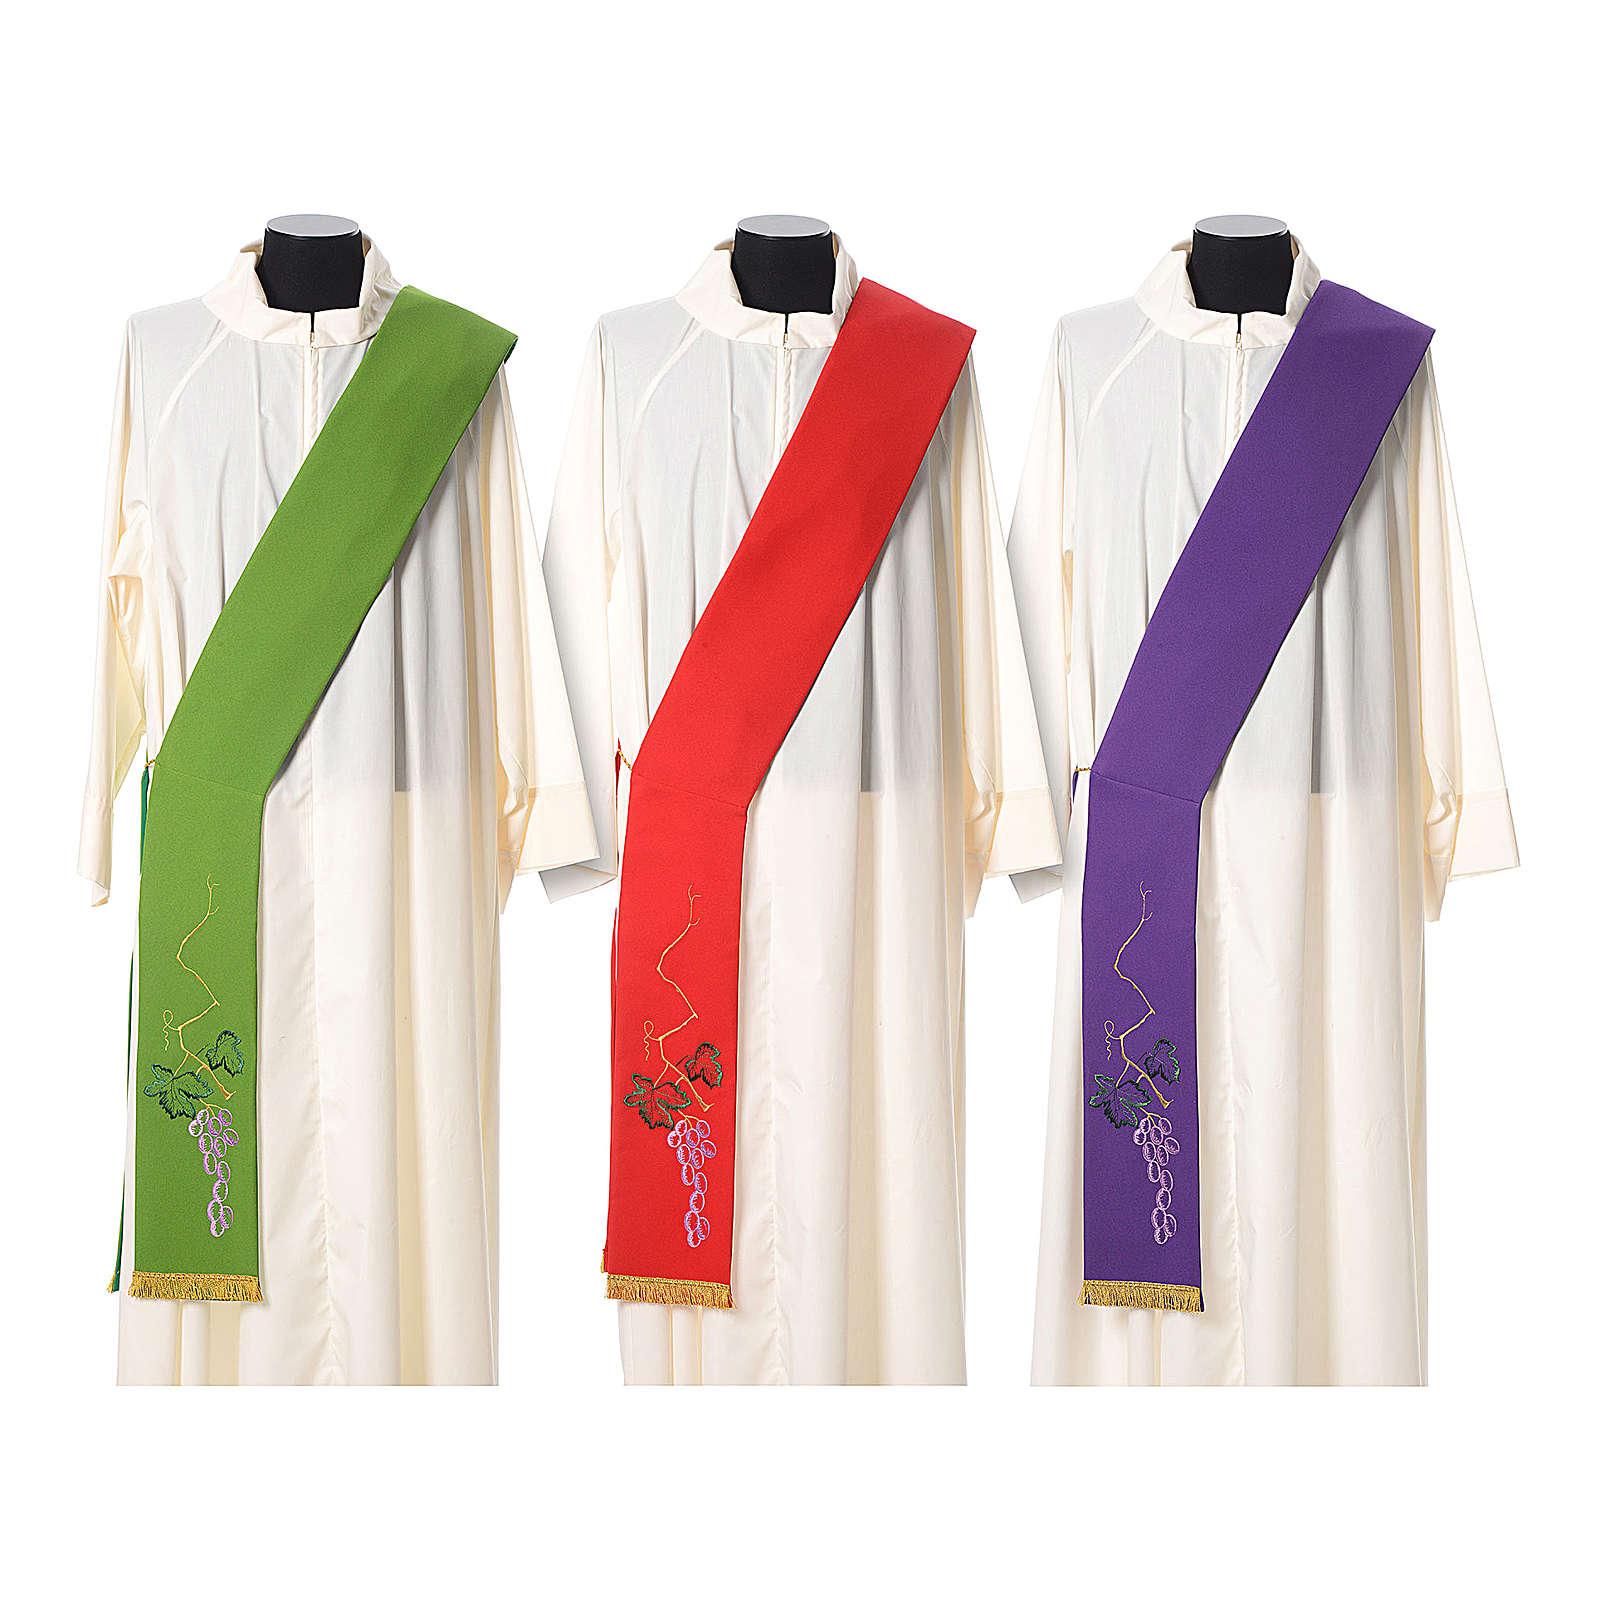 Étole tissu polyester épi doré et vert 4